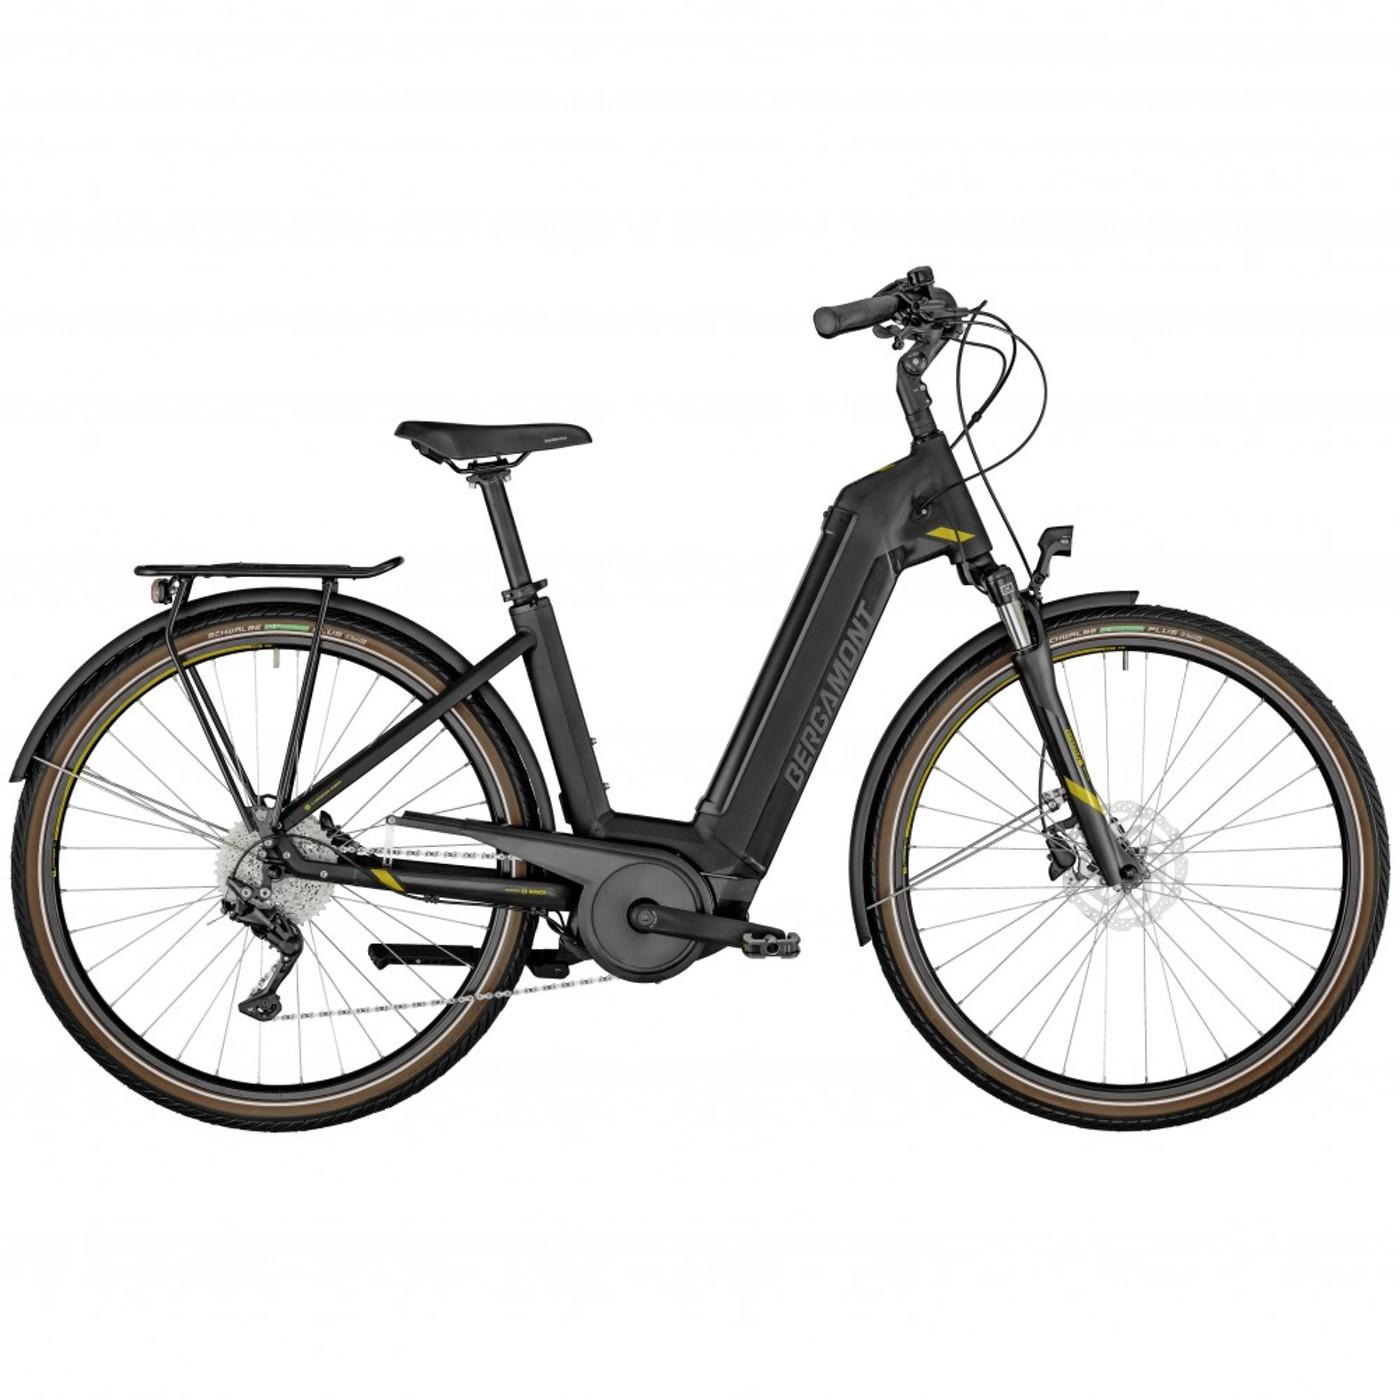 BERGAMONT Bike E-Horizon Edition Gen